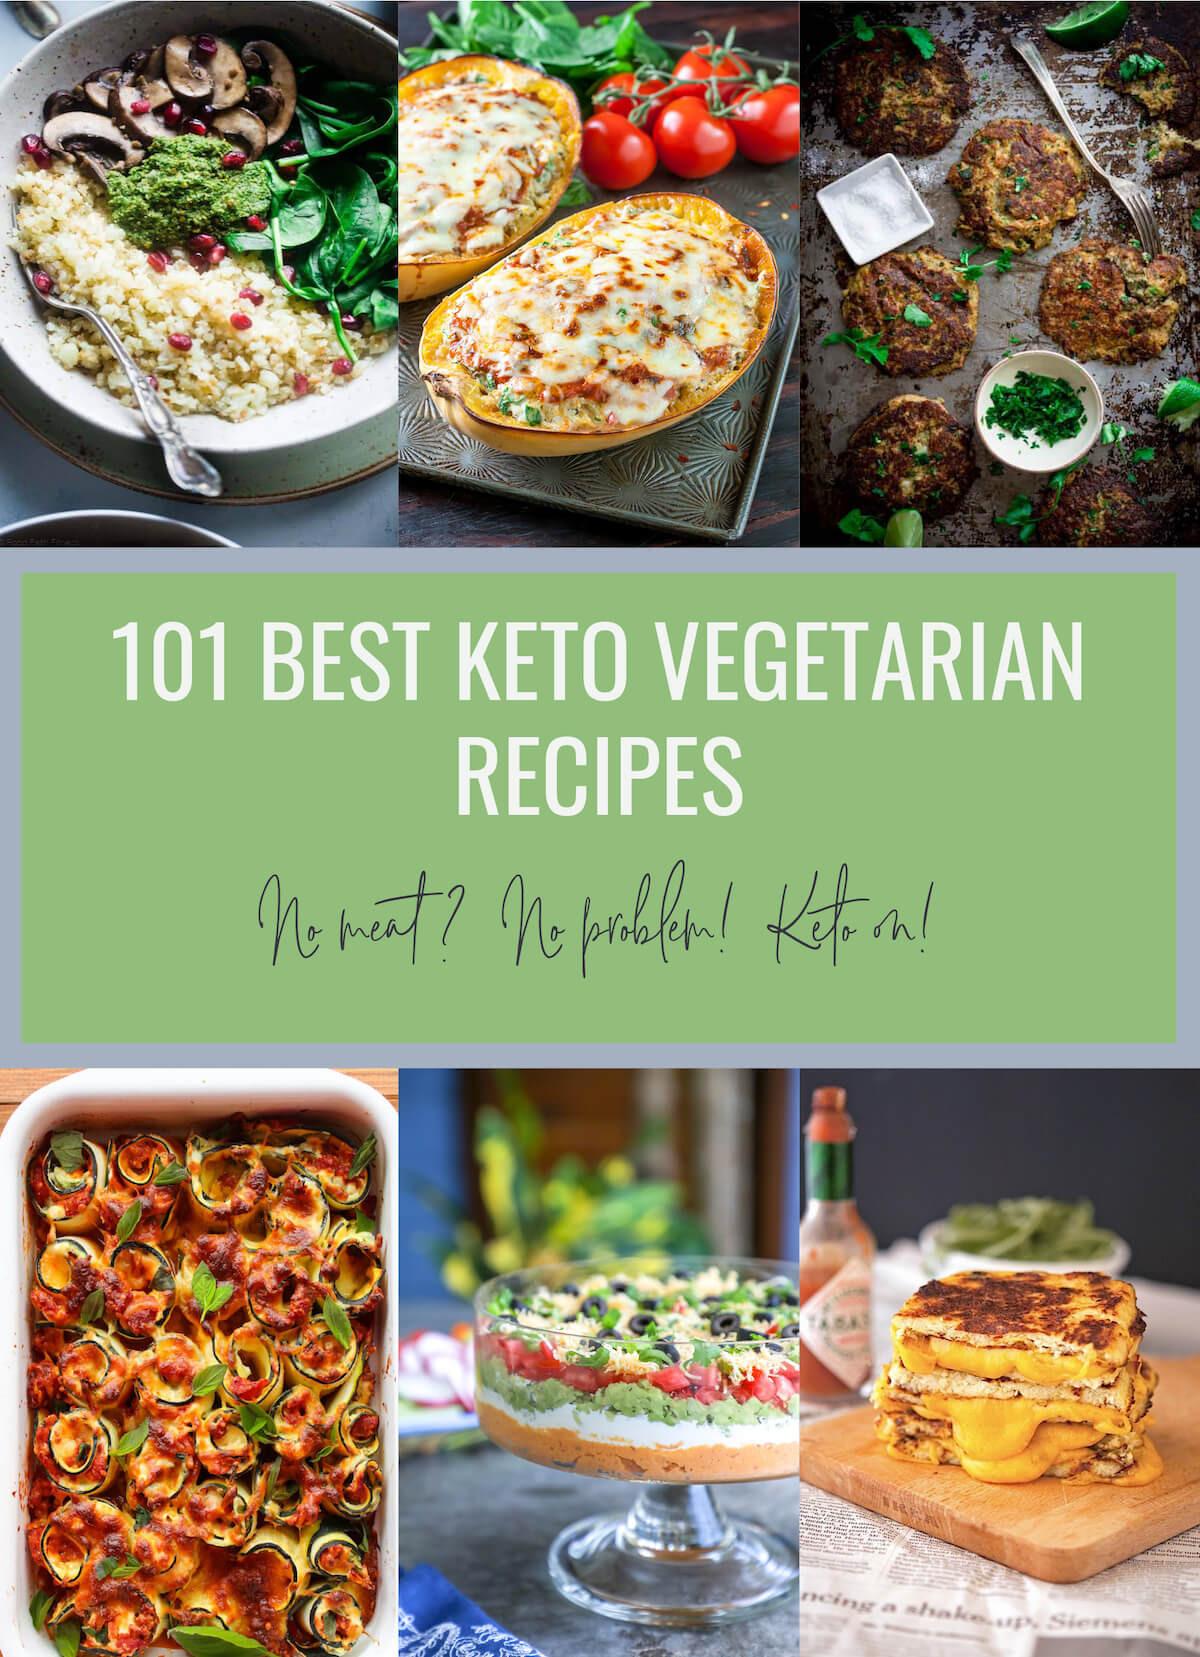 Low Carb Diet Vegetarian  101 Best Keto Ve arian Recipes Low Carb